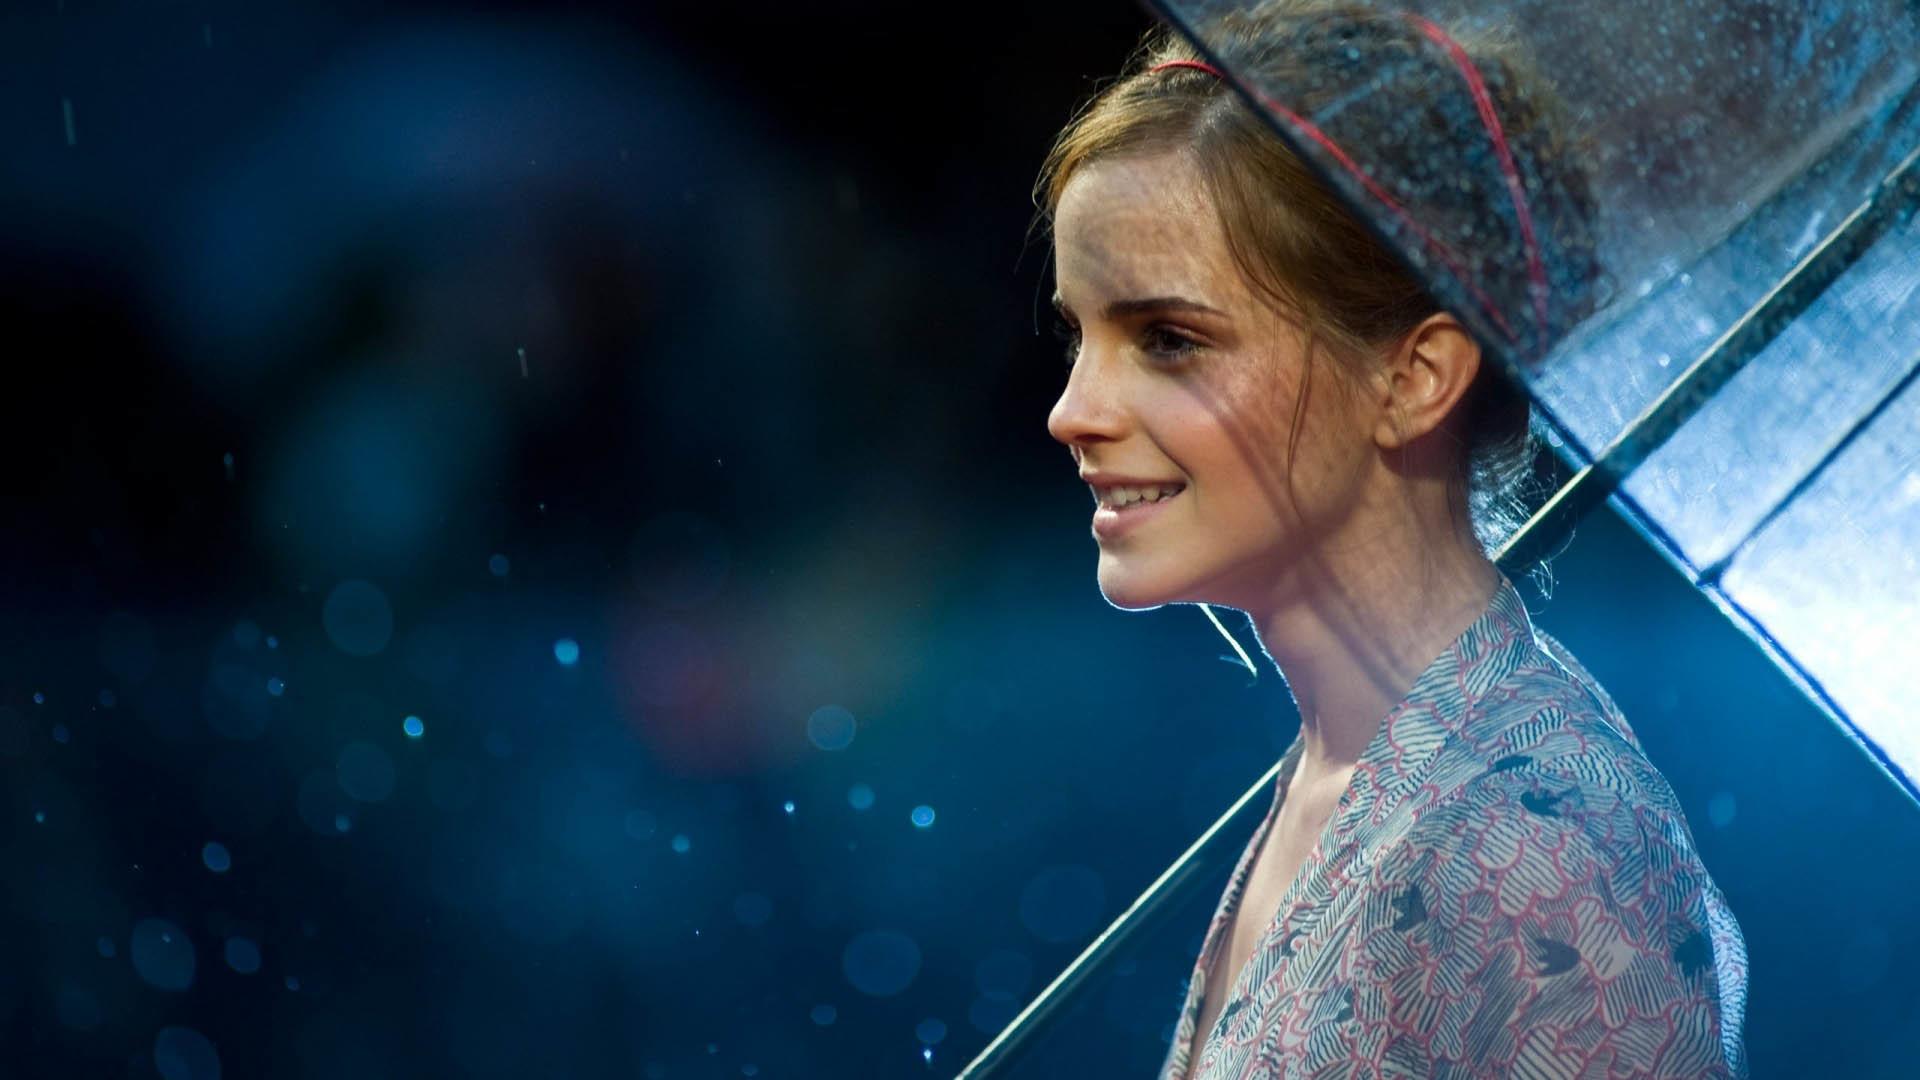 Emma Watson with umbrella wallpaper